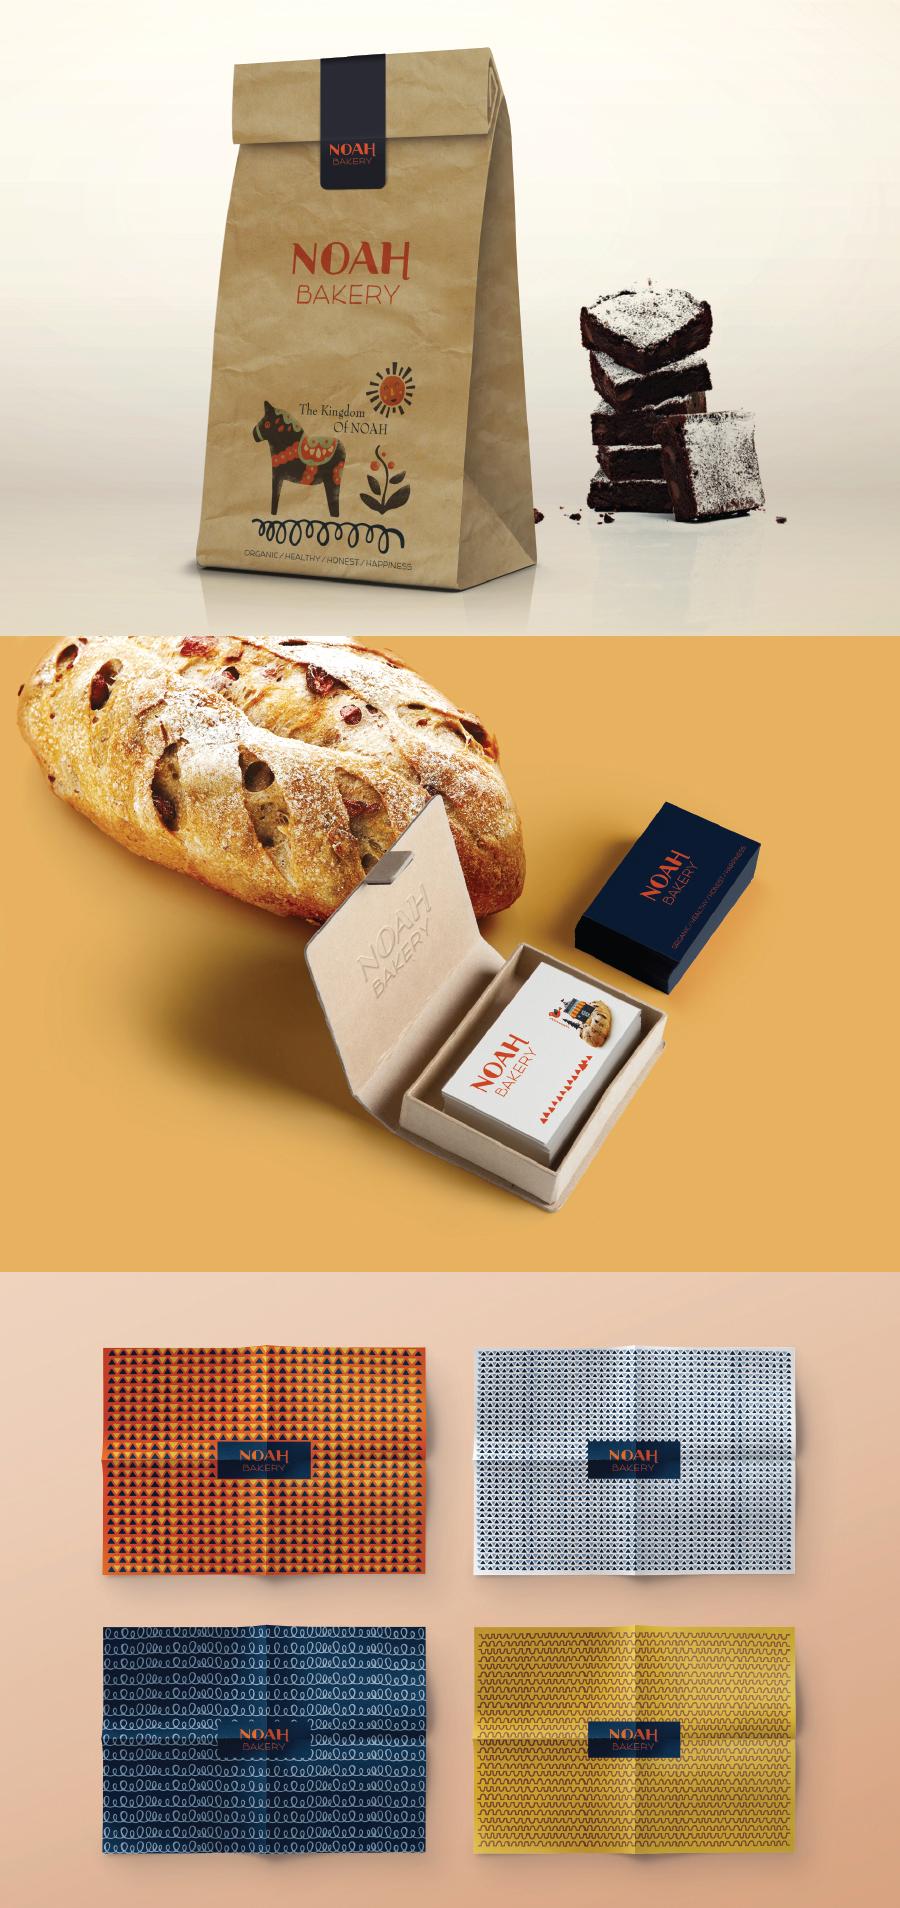 NOAH-Bakery-si-total-900_03